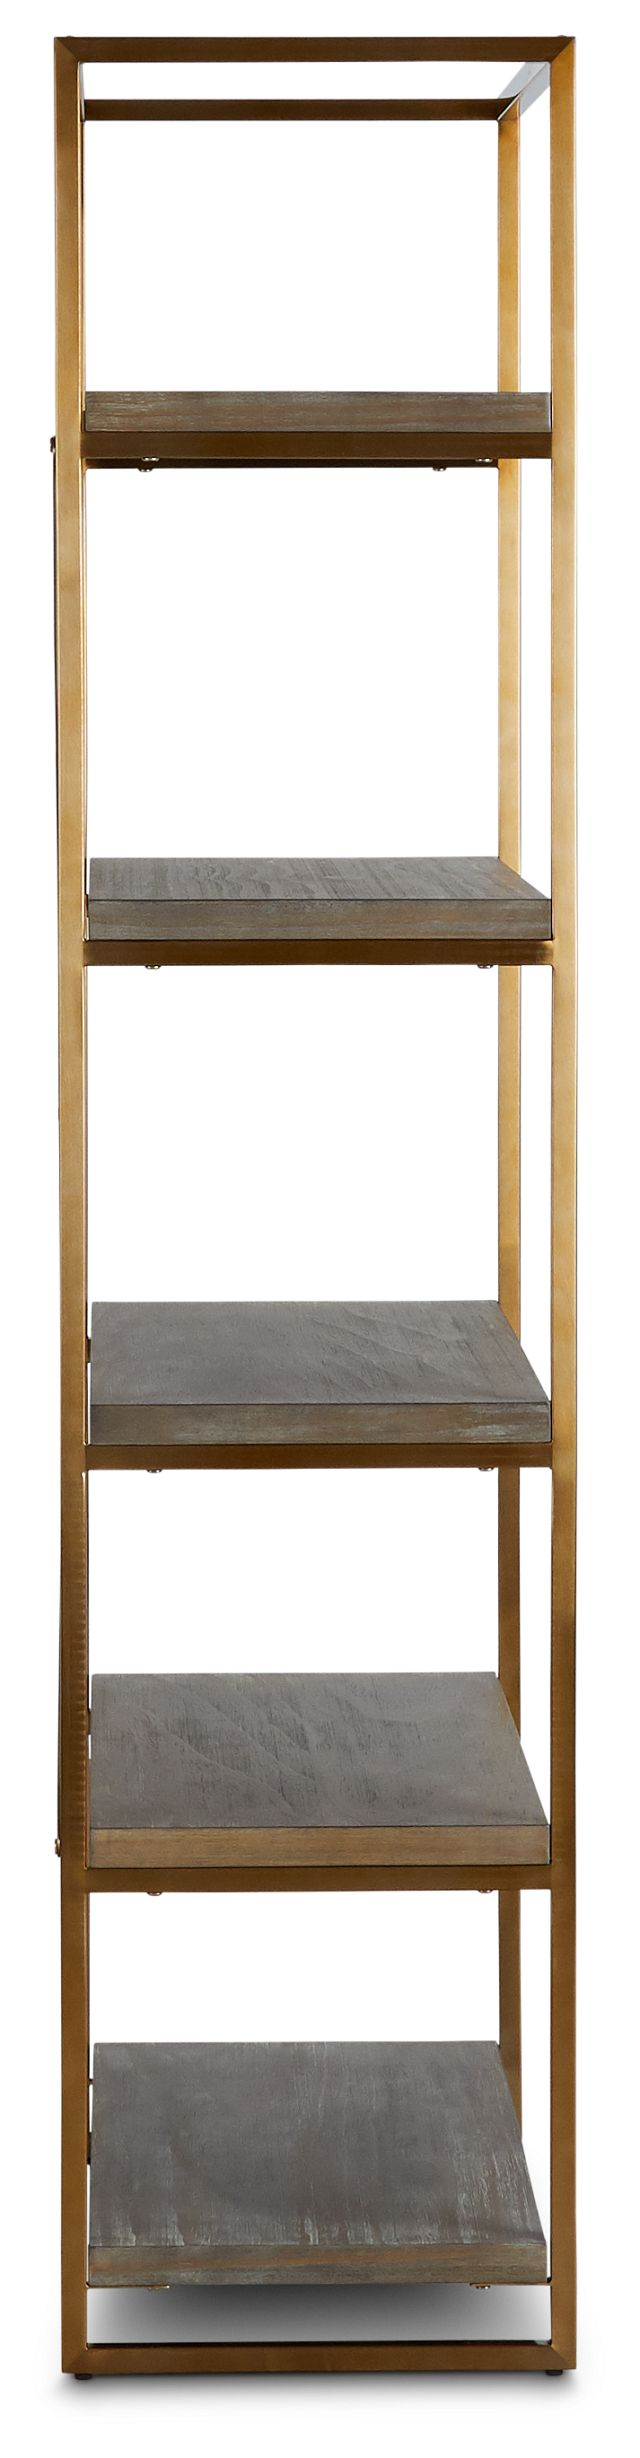 Dexter Brown Bookcase (3)